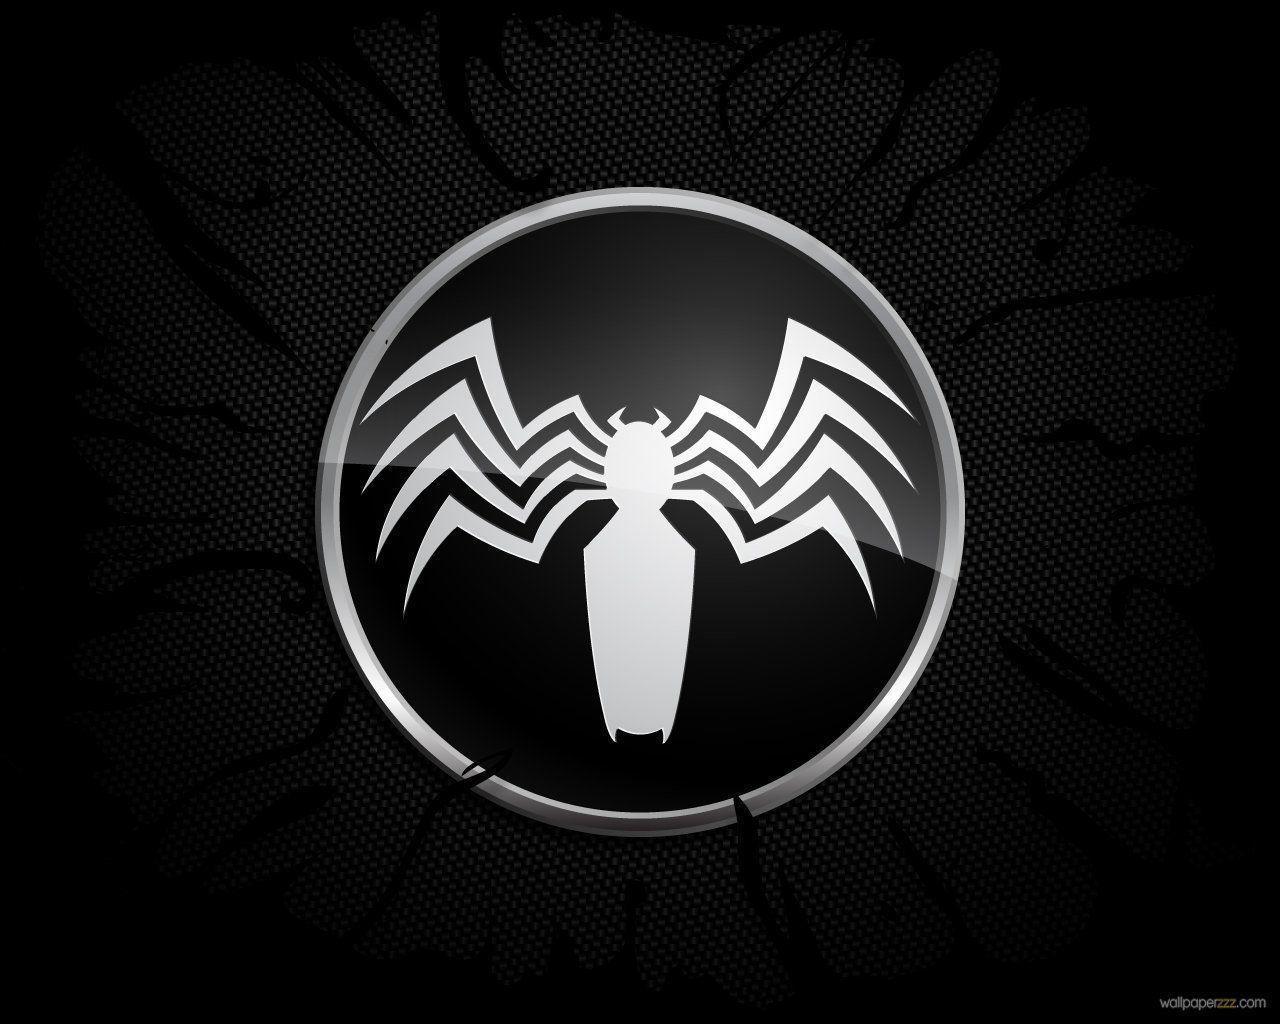 Wallpapers For Spiderman Logo Wallpaper Mobile